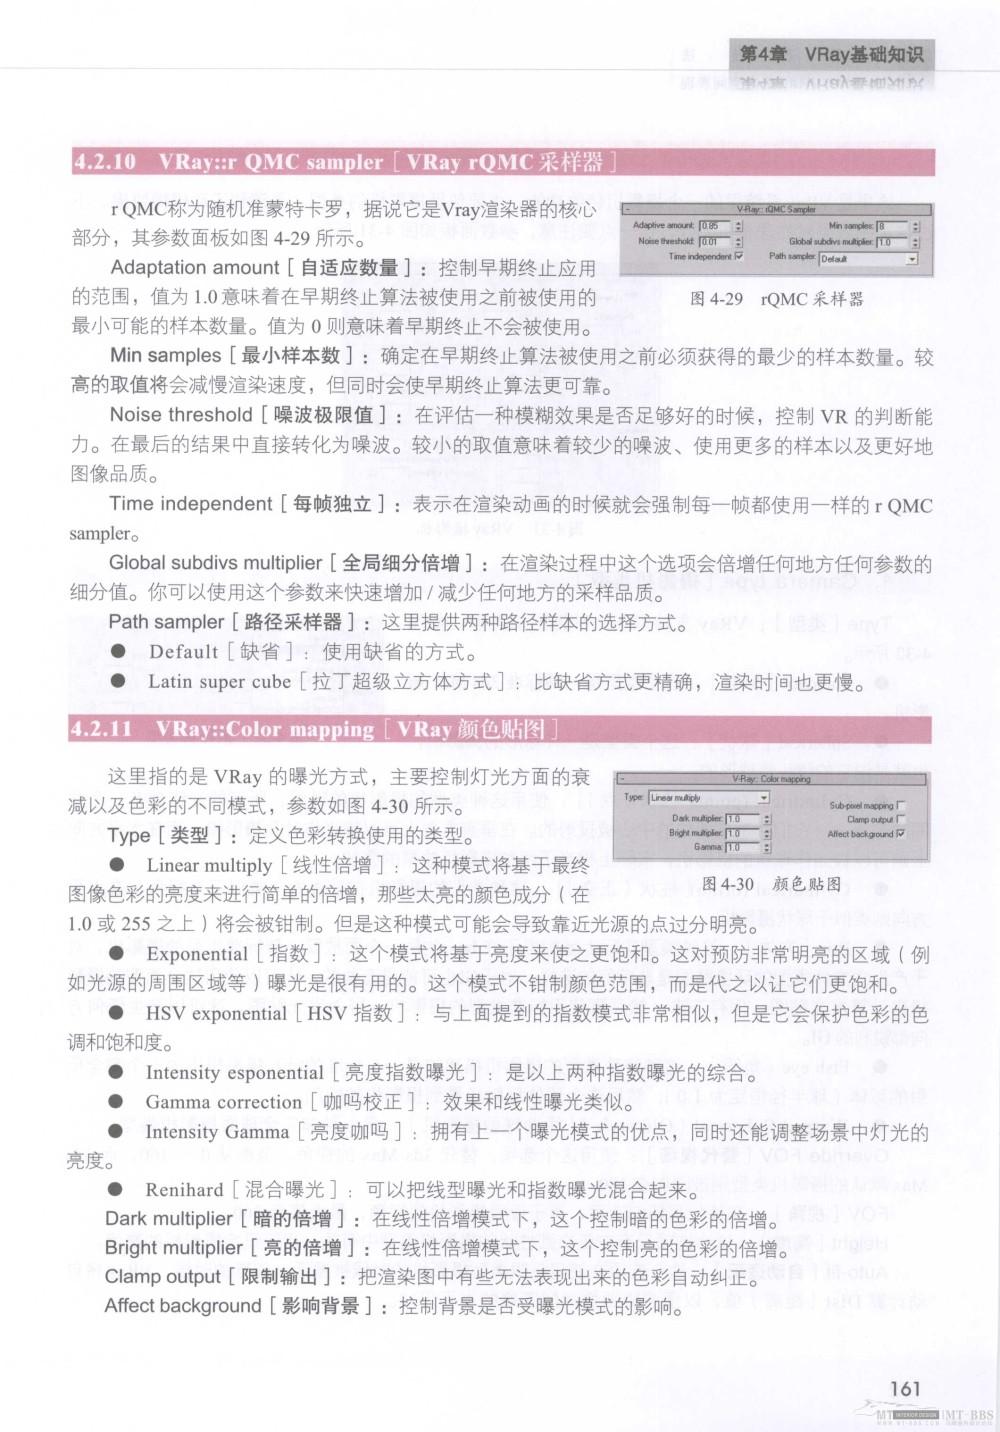 水晶石技法-3ds_Max&VRay室内空间表现_水晶石技法-3ds_Max&VRay室内空间表现_页面_167.jpg